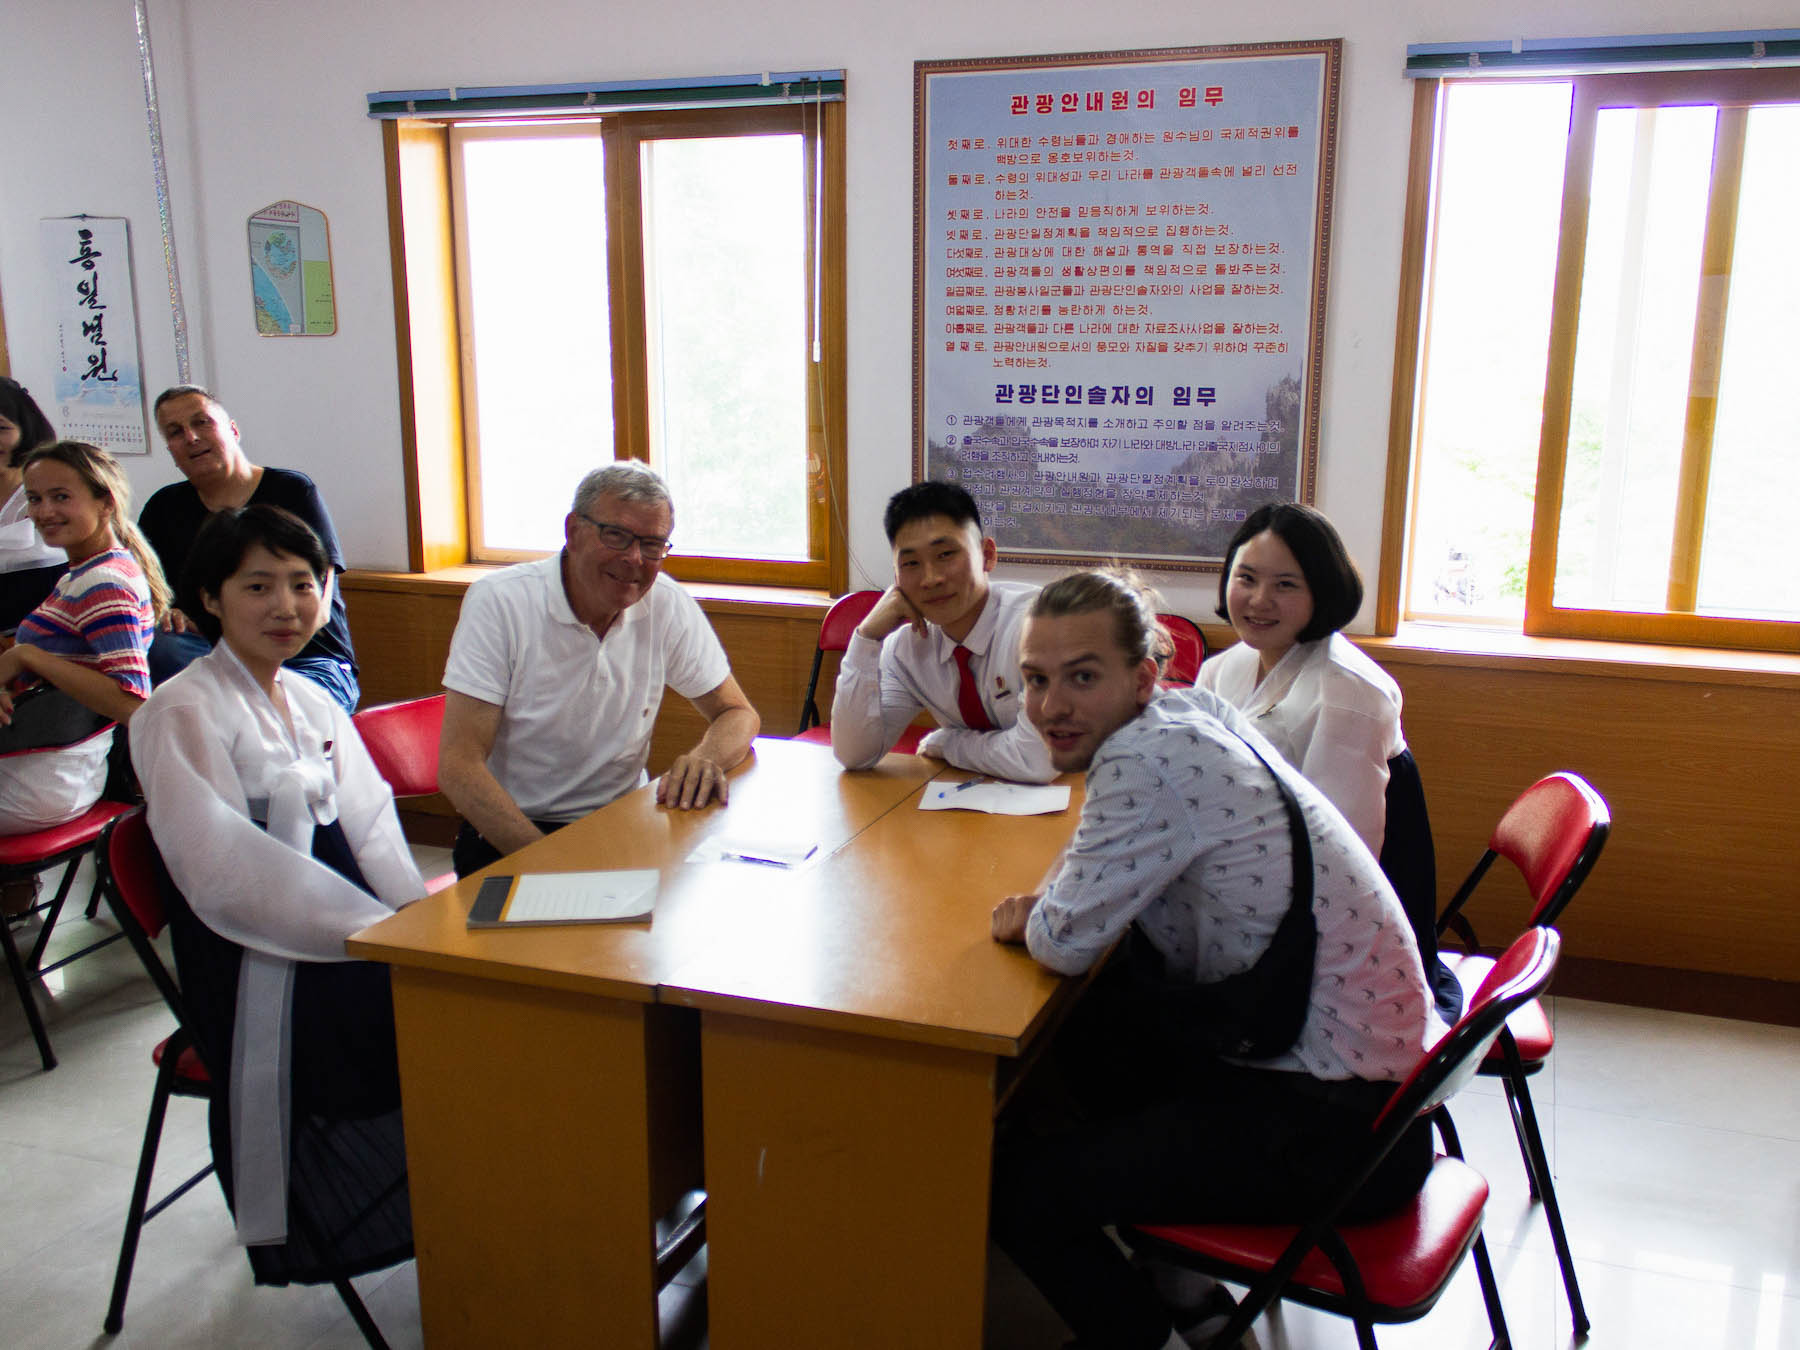 Mødet med de studerende nordkoreanere